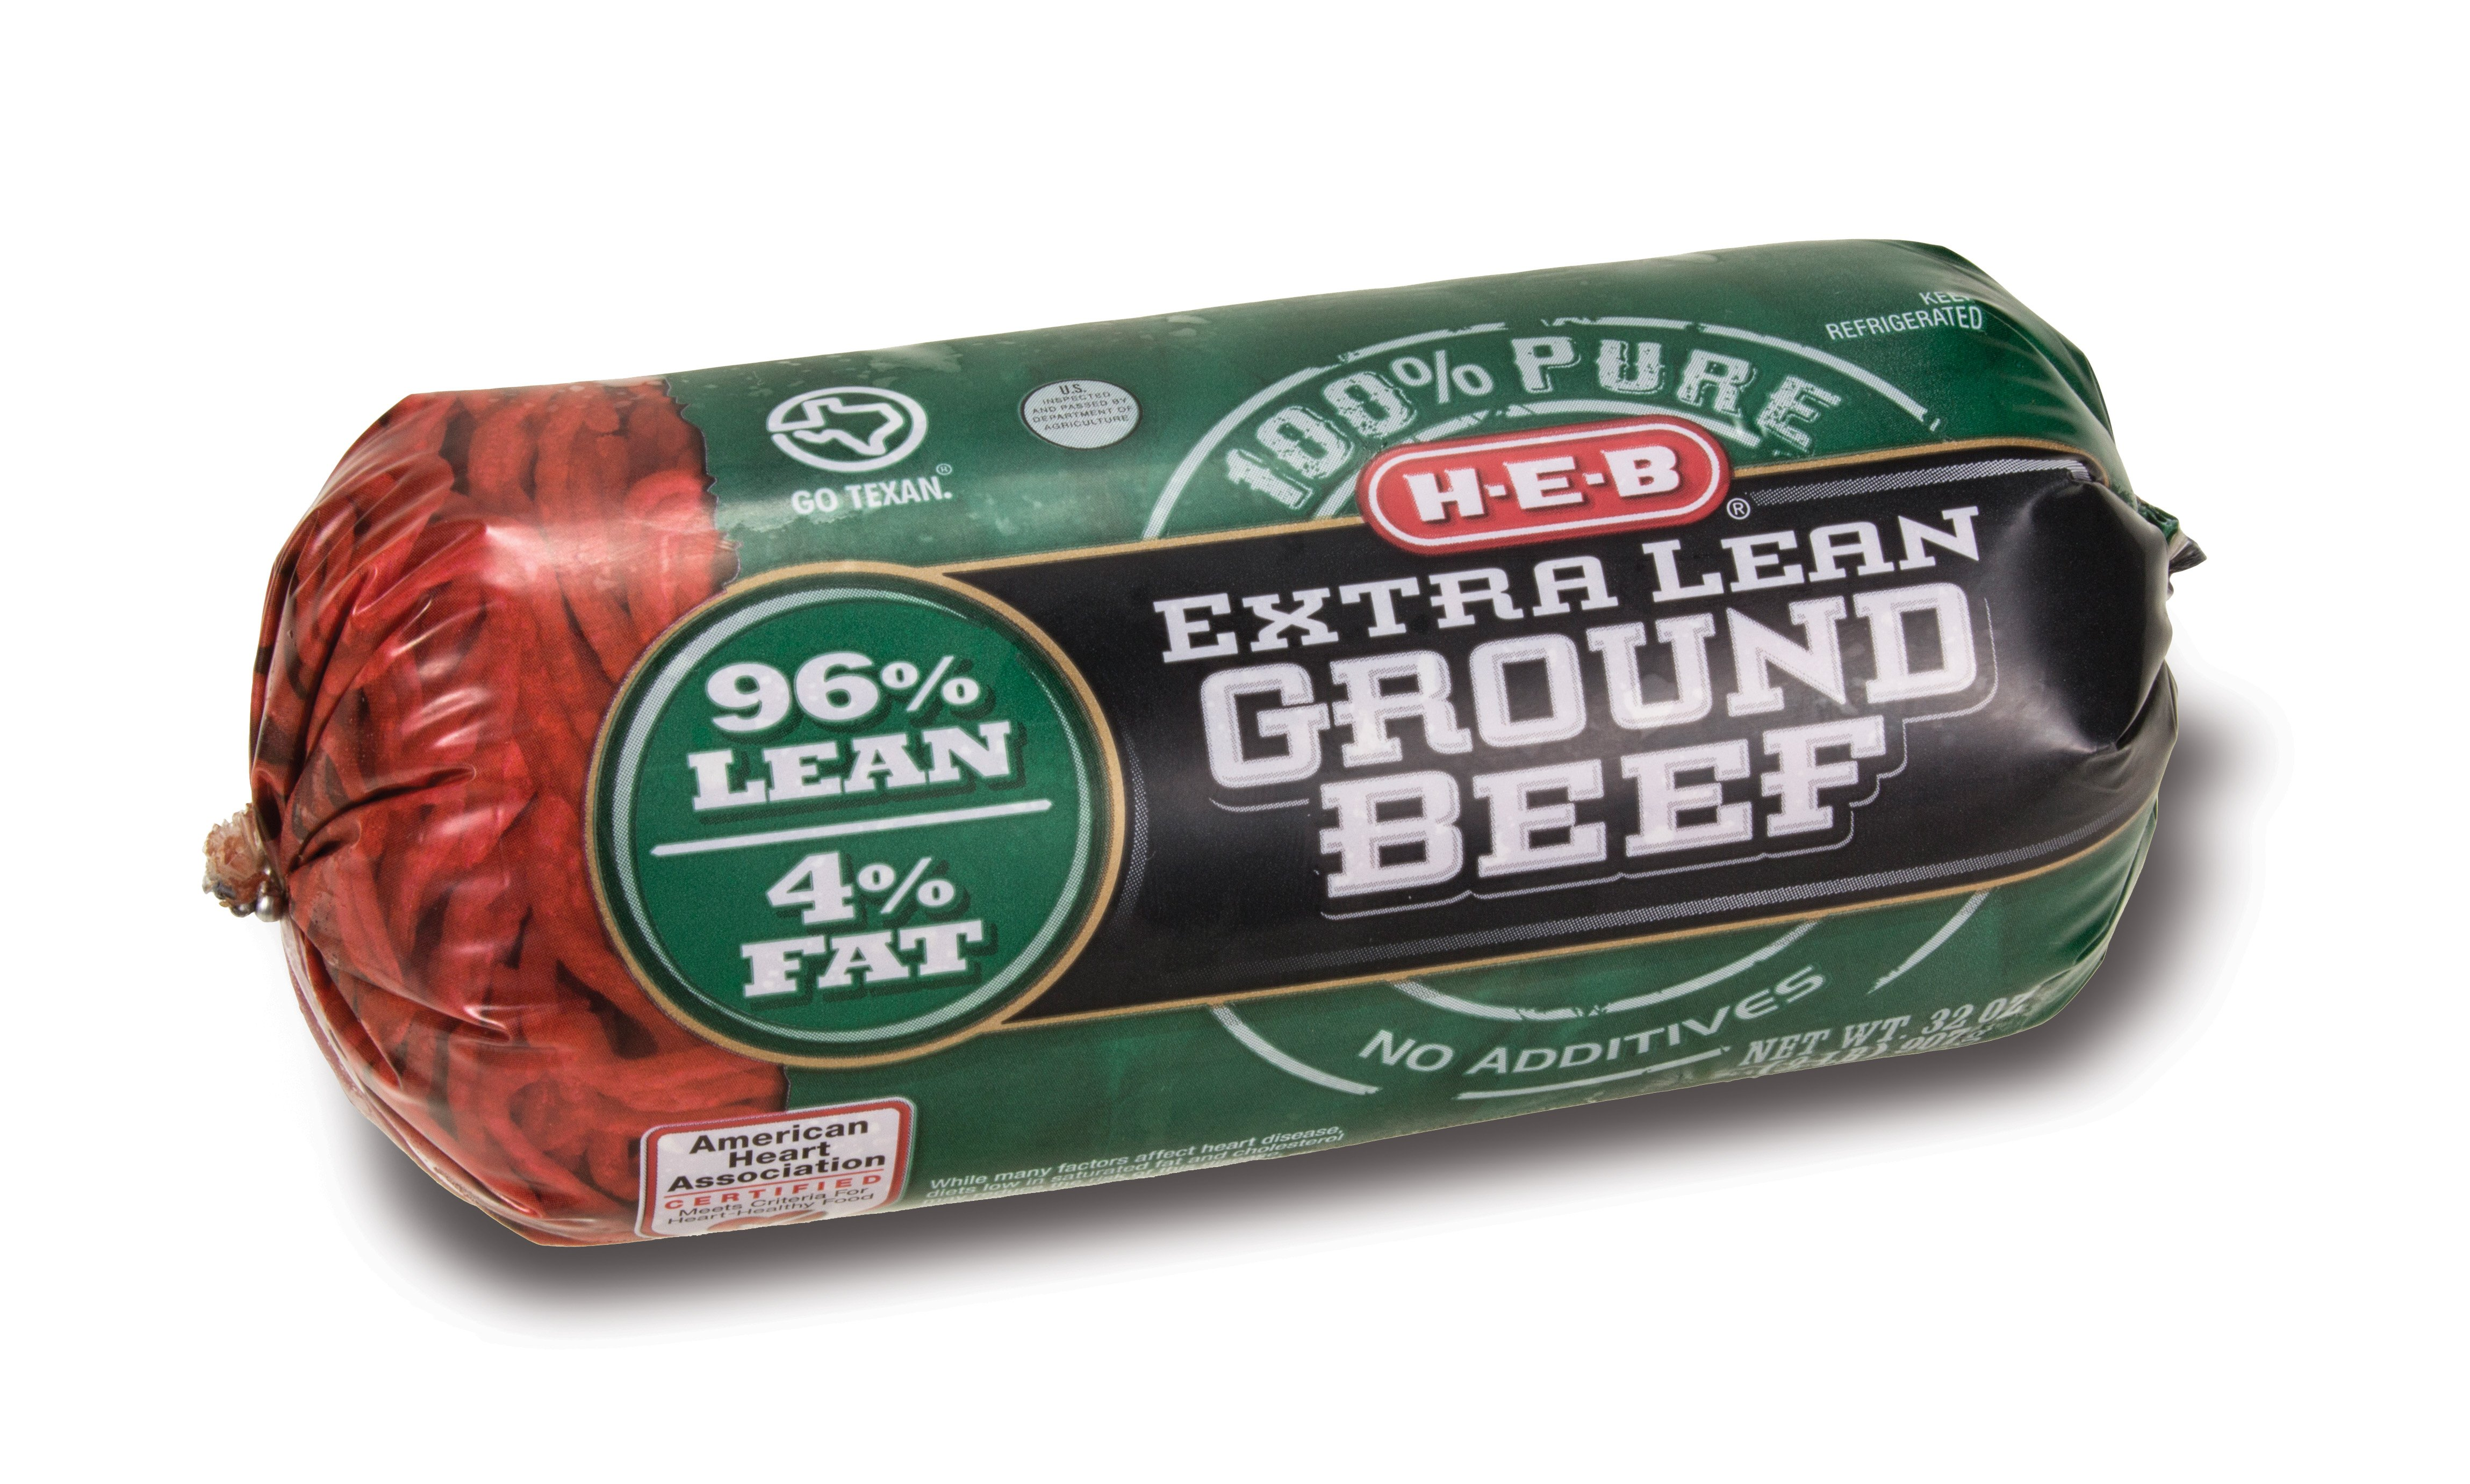 ground beef shop heb everyday low prices online